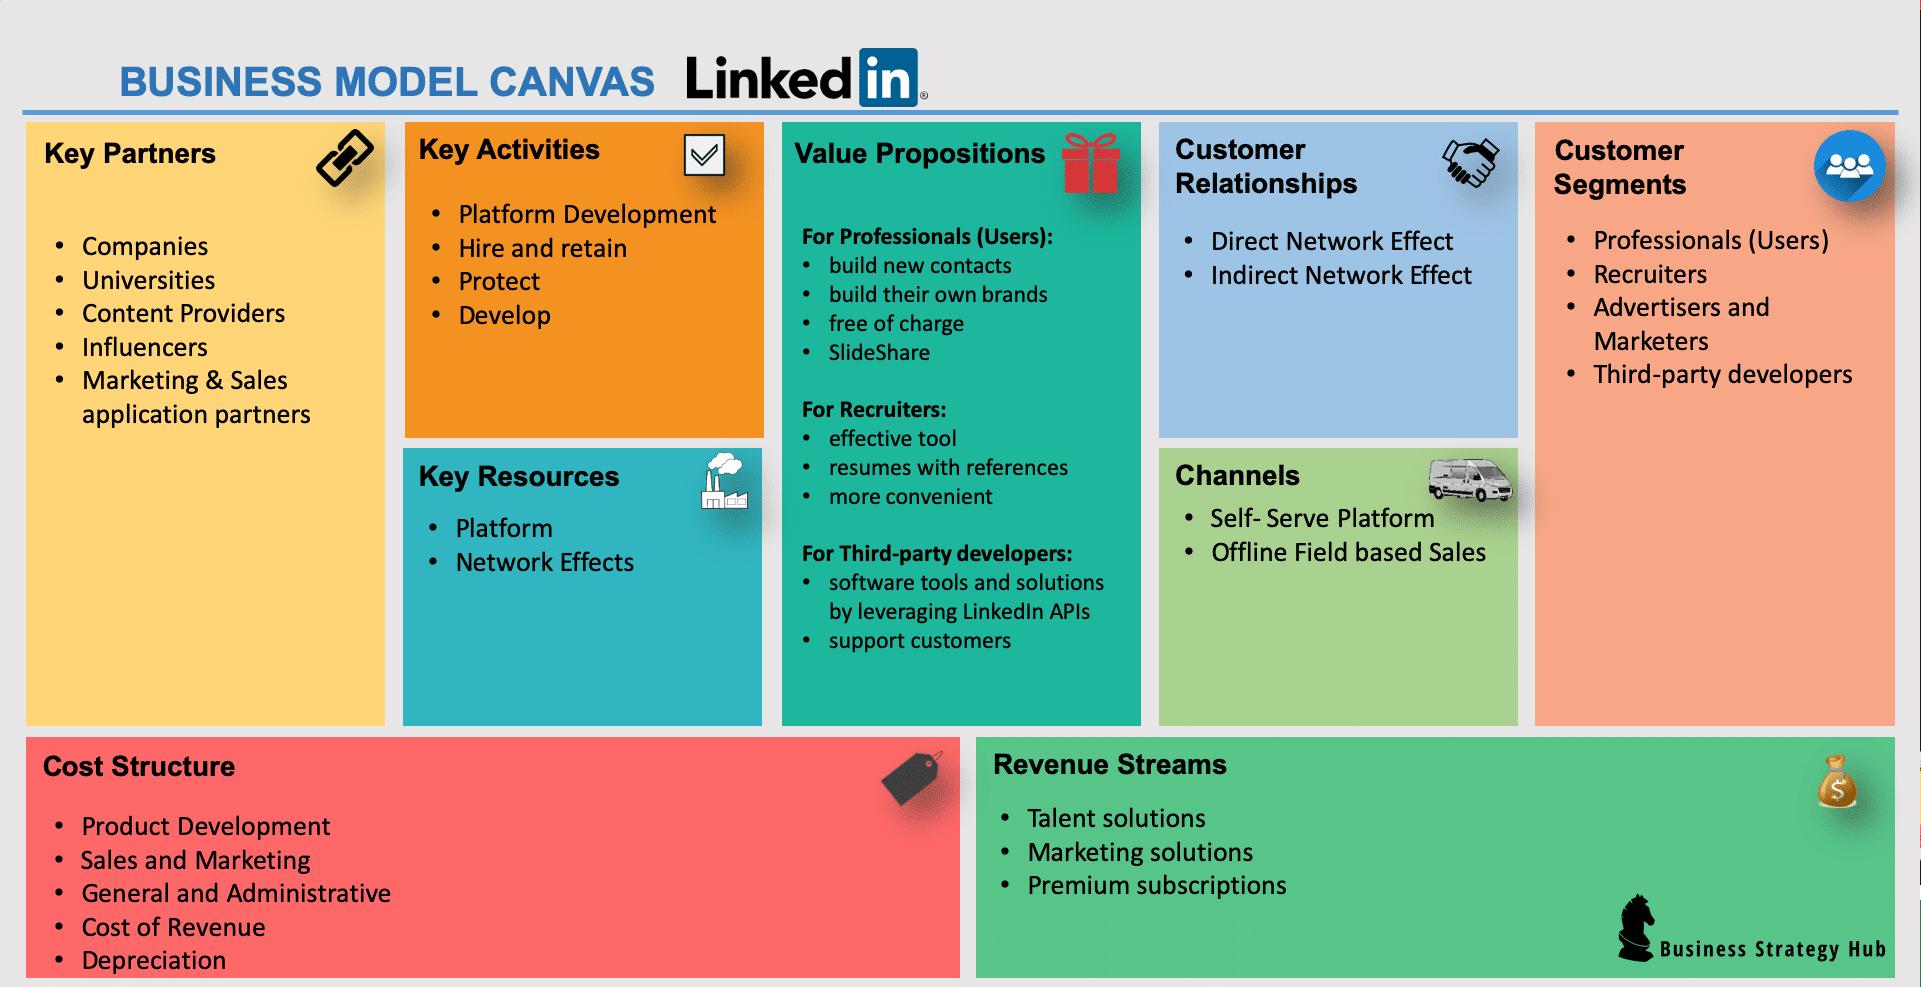 LinkedIn Business Model (2020)  How does LinkedIn make money?   Business Strategy Hub